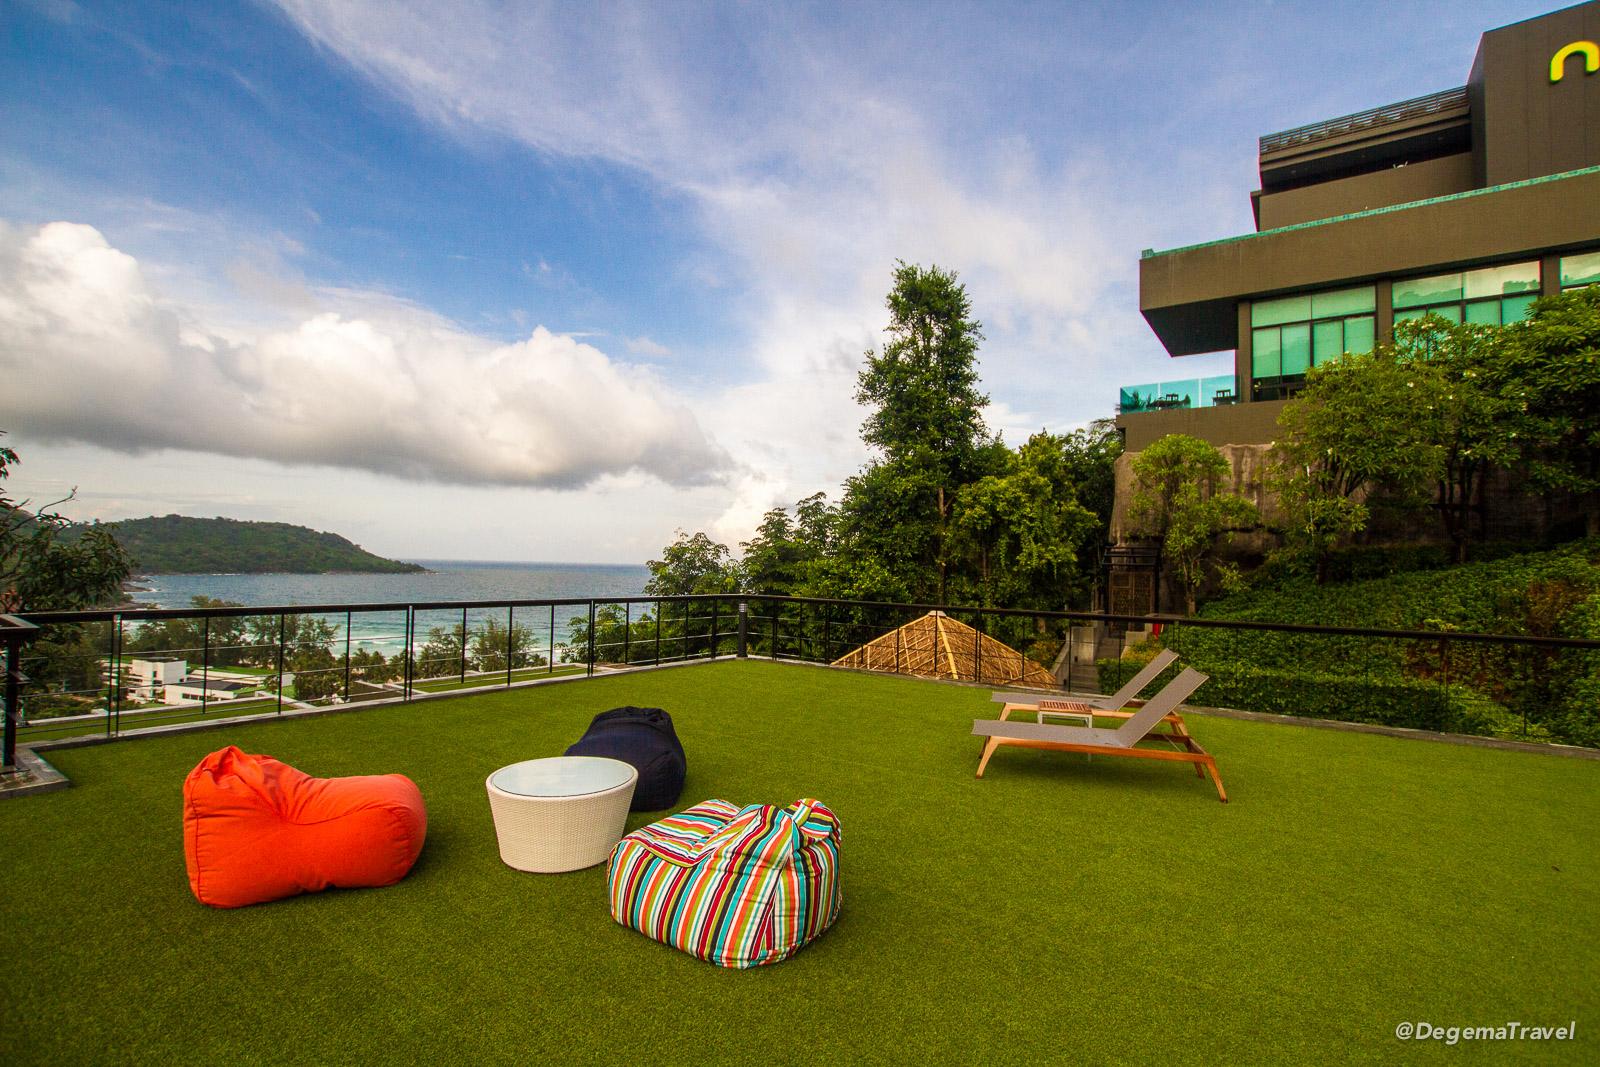 Roof of the Honeymoon Villa at Nook-Dee Boutique Resort in Phuket, Thailand